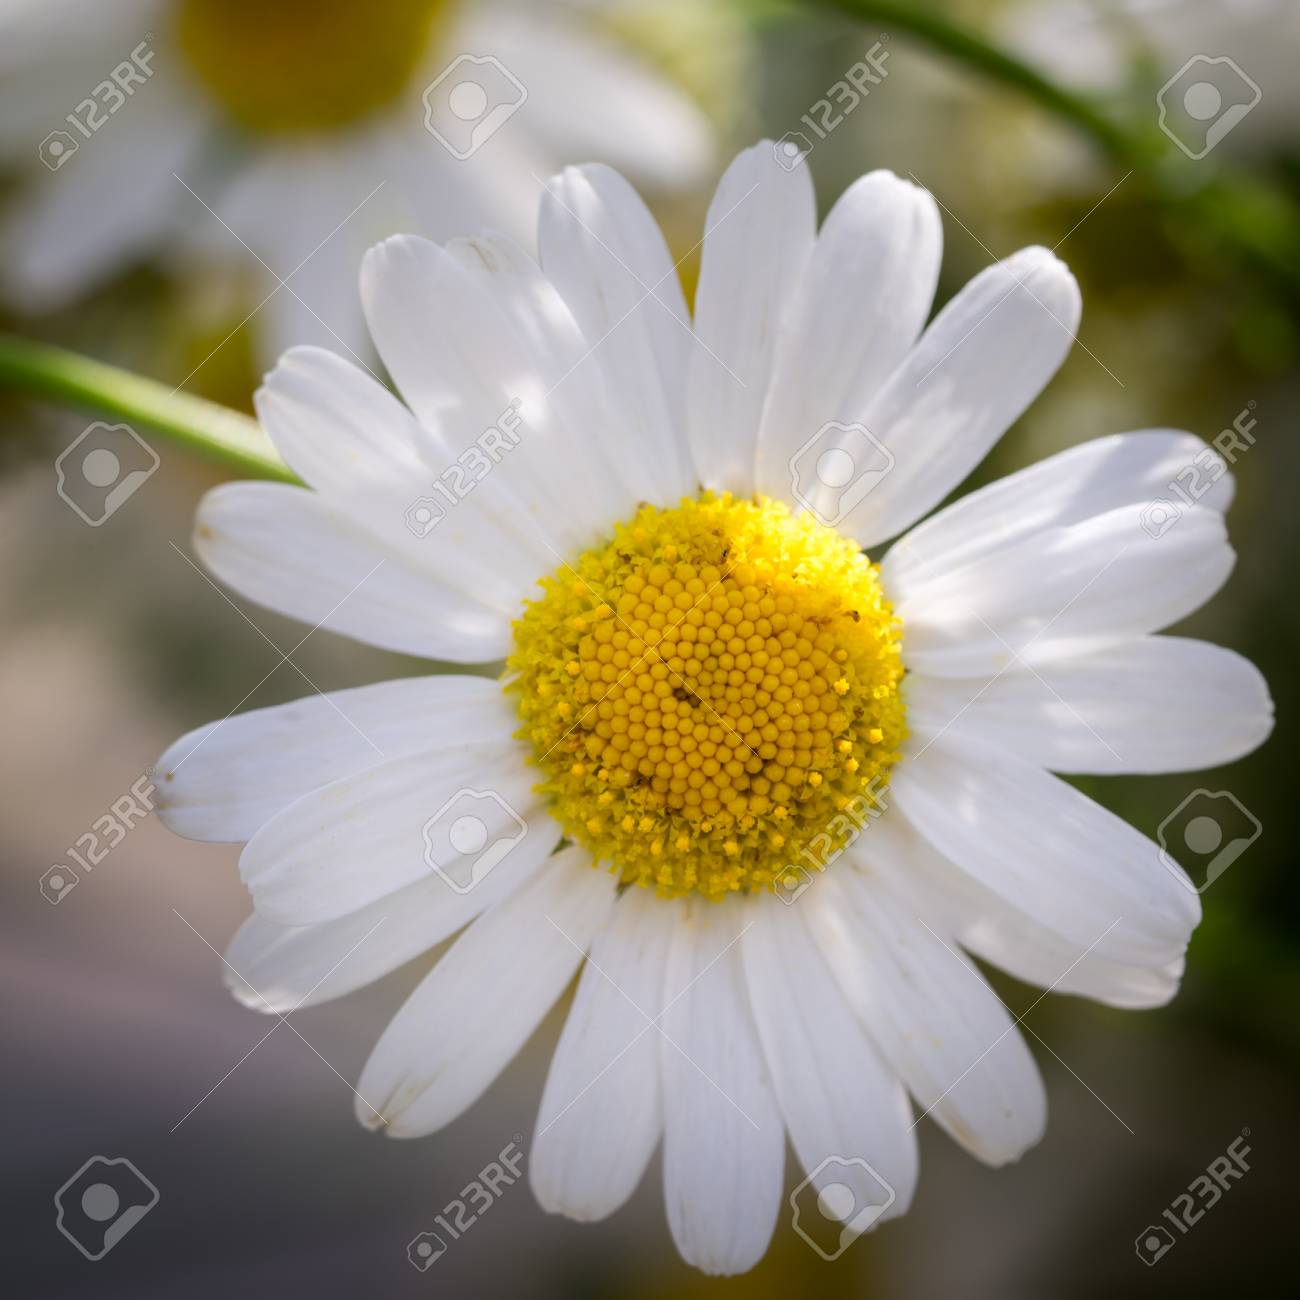 Beautiful daisy flower stock photo picture and royalty free image beautiful daisy flower stock photo 42523168 izmirmasajfo